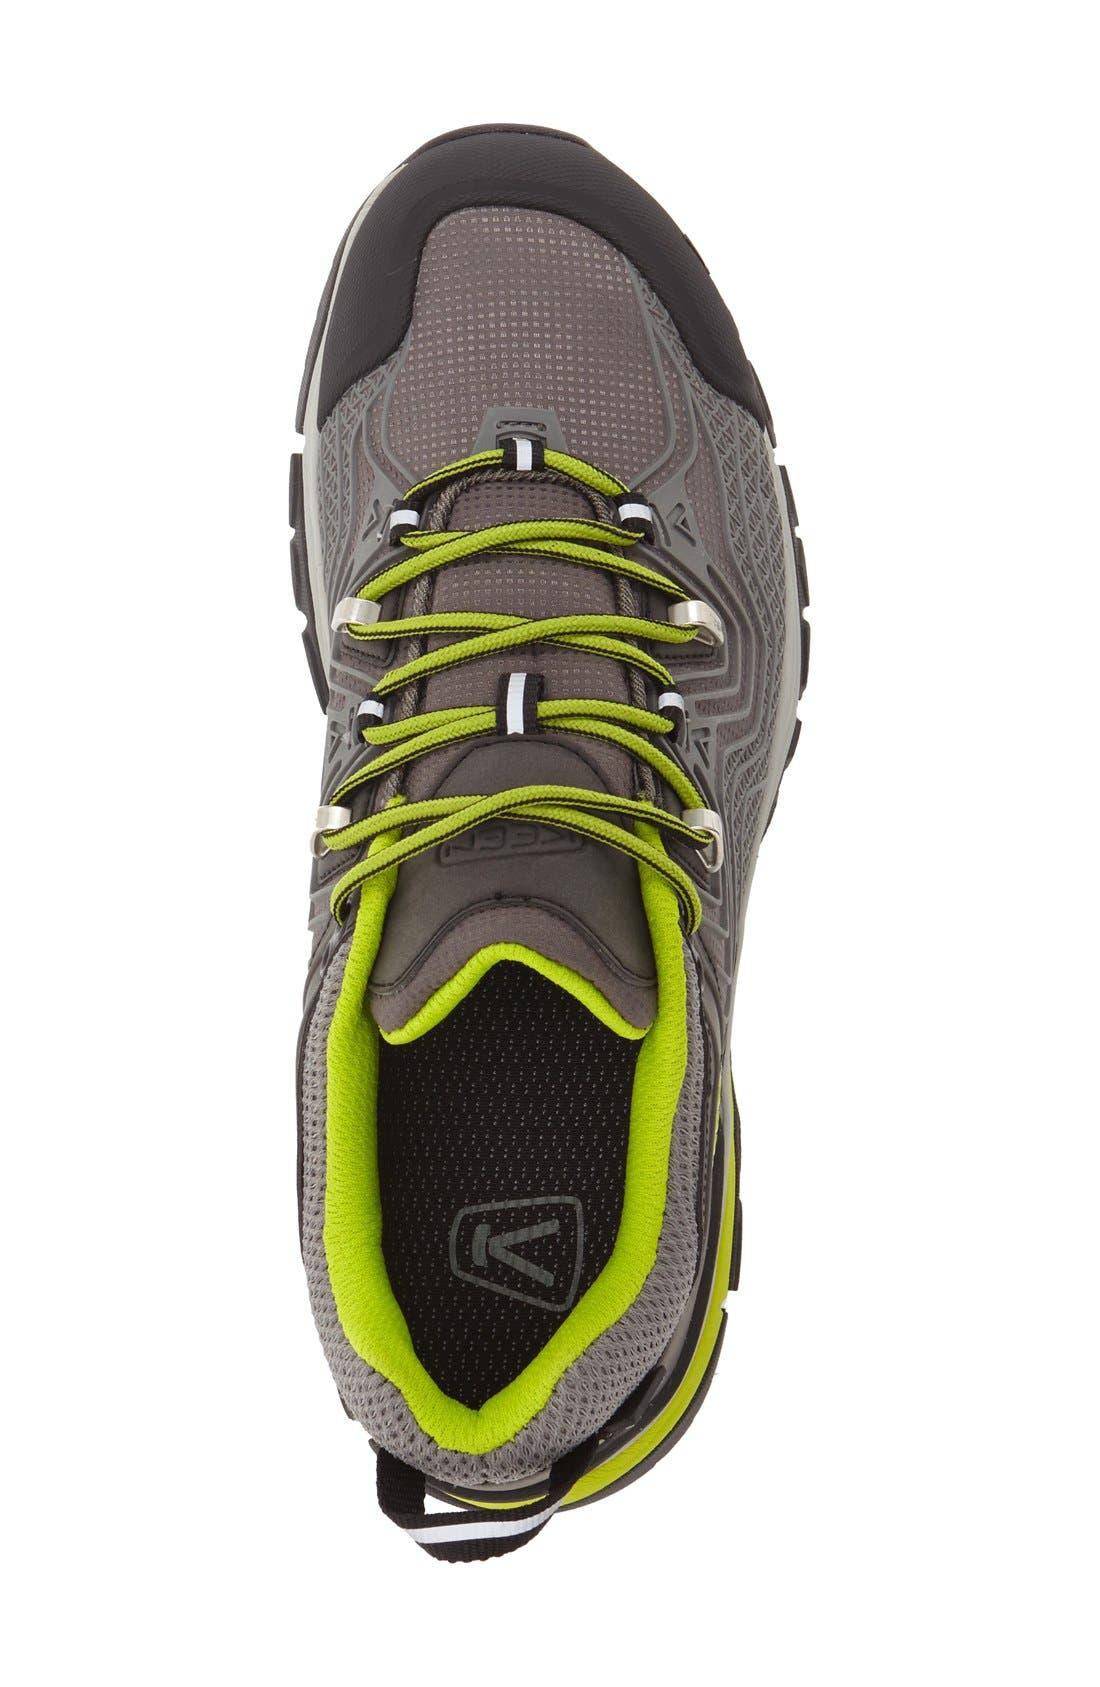 Alternate Image 3  - Keen 'Aphlex' Waterproof Low Profile Hiking Shoe (Men)